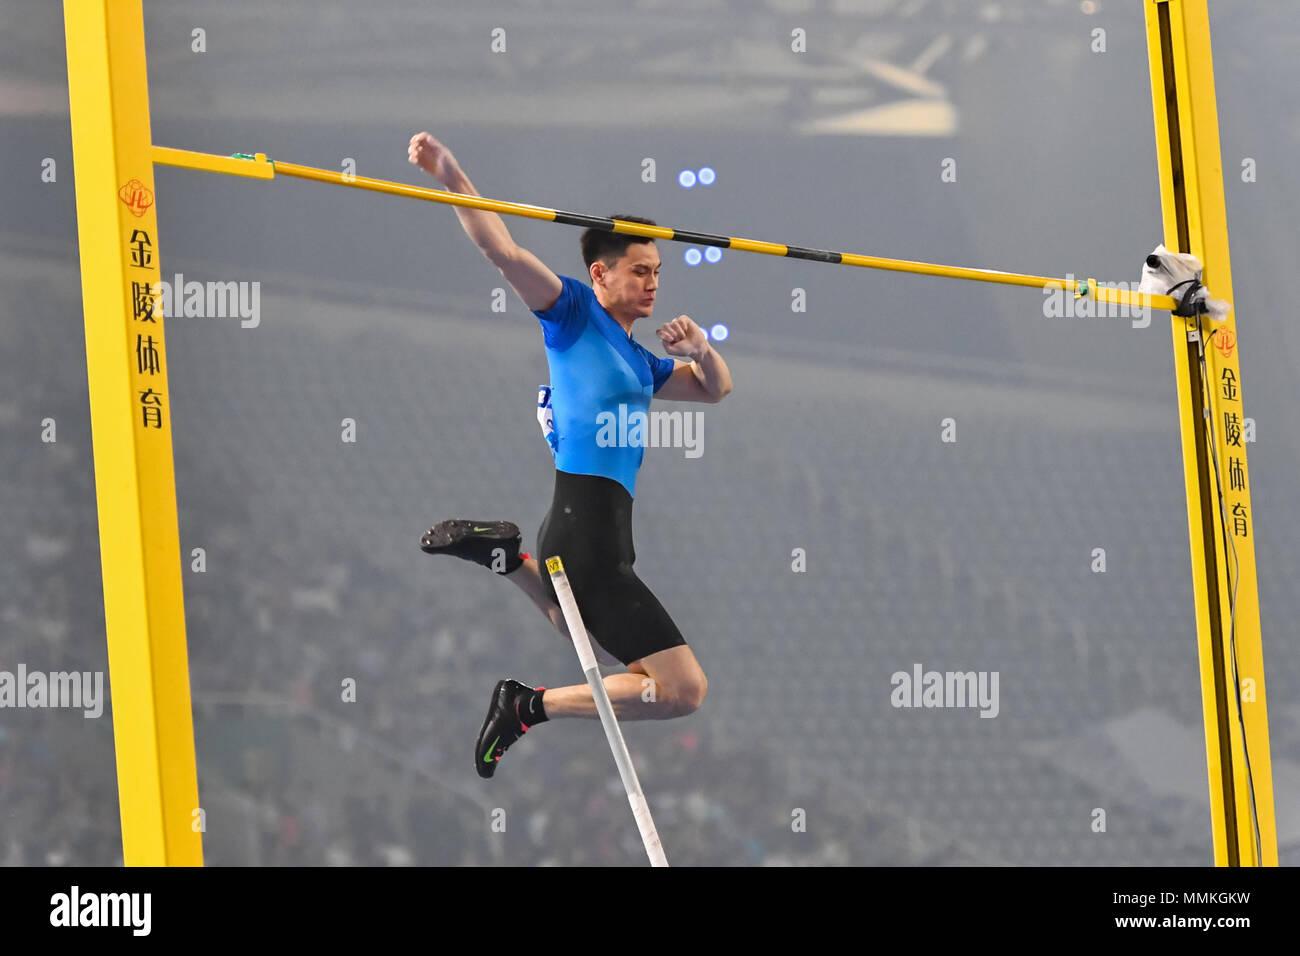 Shanghai, China. 12th May 2018. Jao Jie (CHN) in action during 2018 IAAF Shanghai Diamond League: MEN'S POLE VAULT at Shanghai Stadium on Saturday, 12 May 2018. SHANGHAI, CHINA. Credit: Taka G Wu Credit: Taka Wu/Alamy Live News - Stock Image